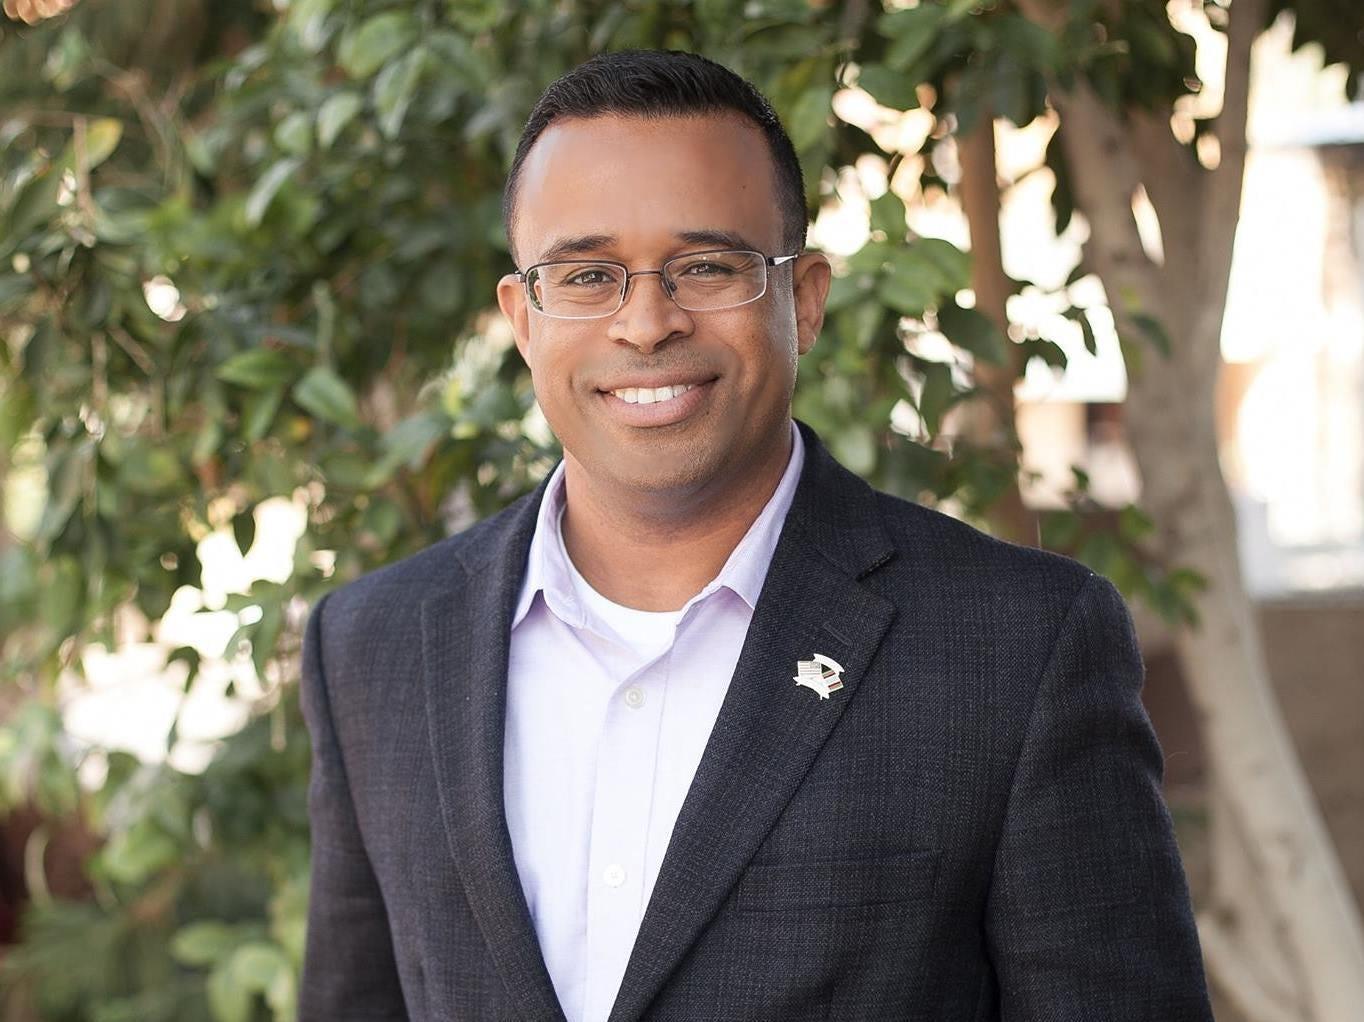 Republican Moses Sanchez is running for mayor of Phoenix.